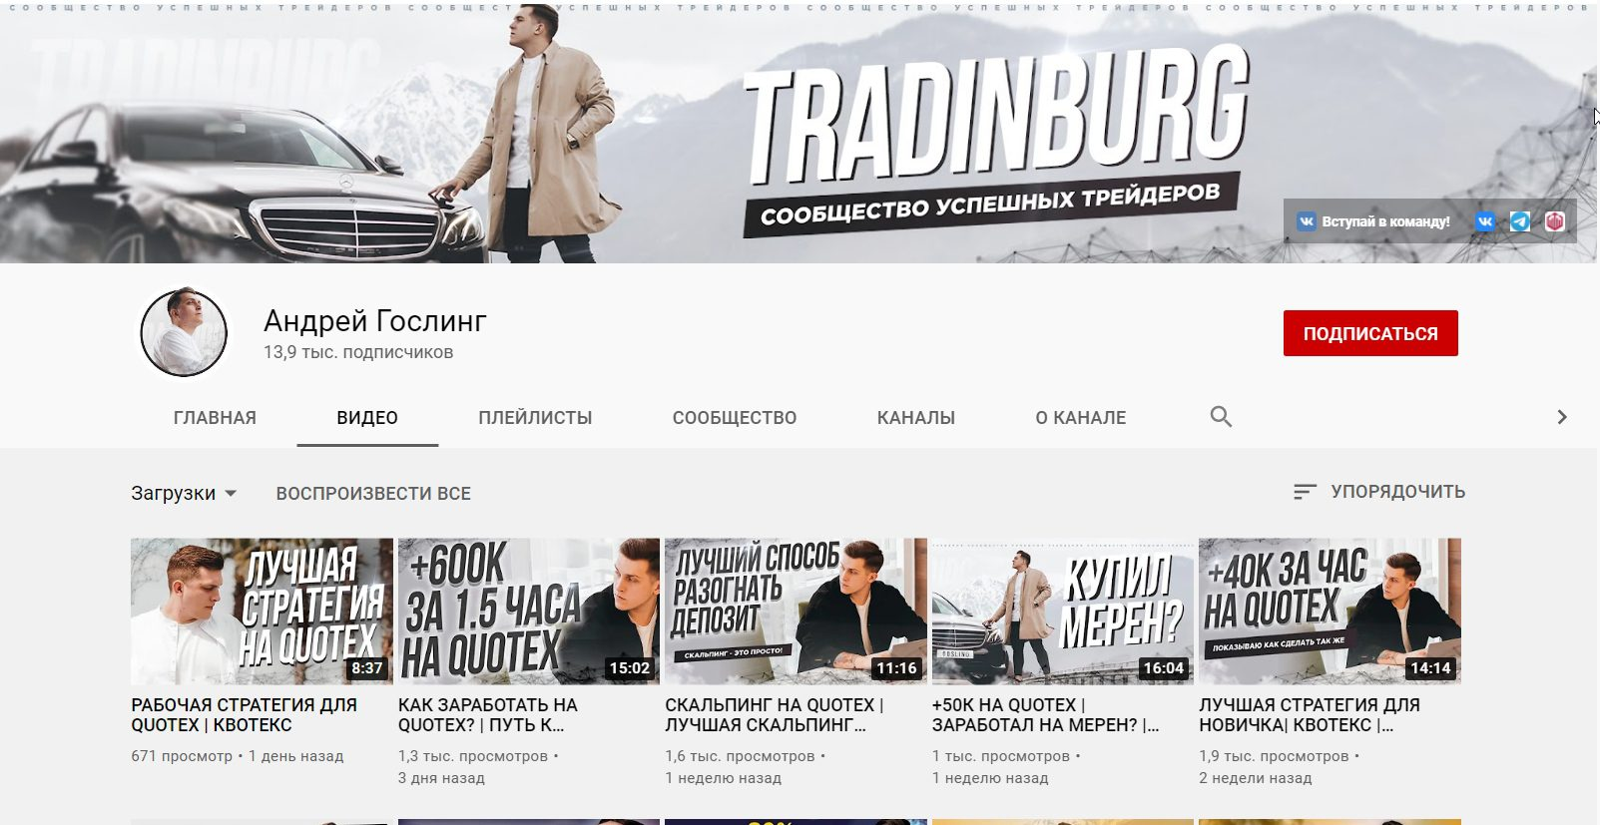 Андрей Гослинг и клуб Tradinburg